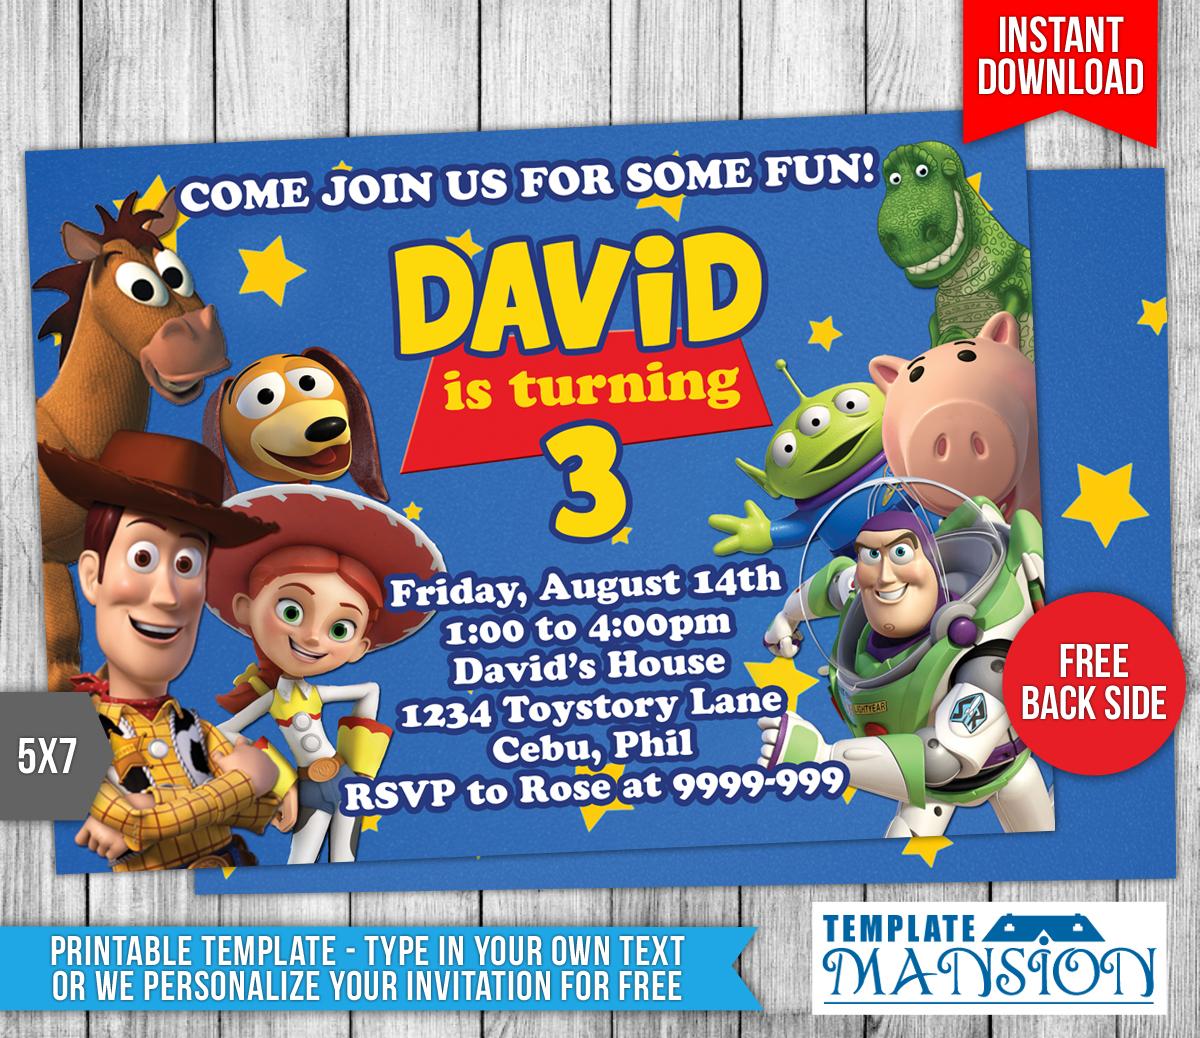 Toy Story Birthday Invitation 1 By Templatemansion On DeviantArt